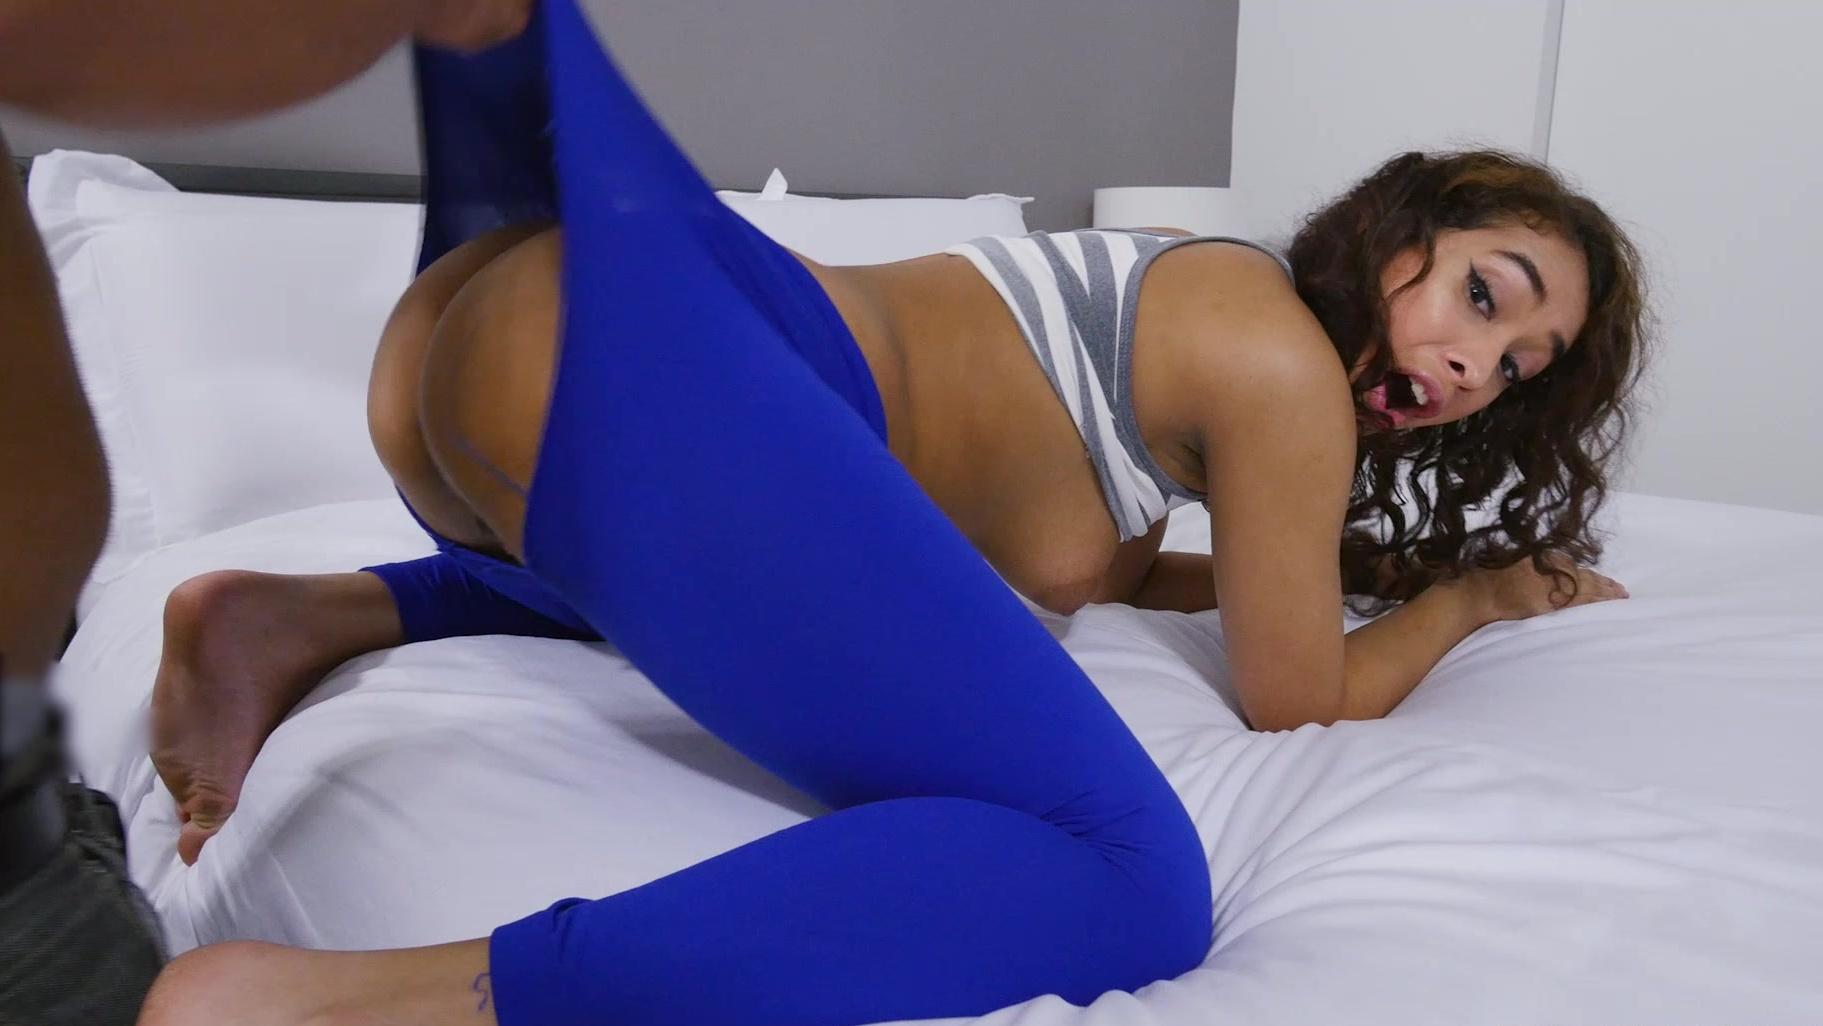 Blue yoga pants porn